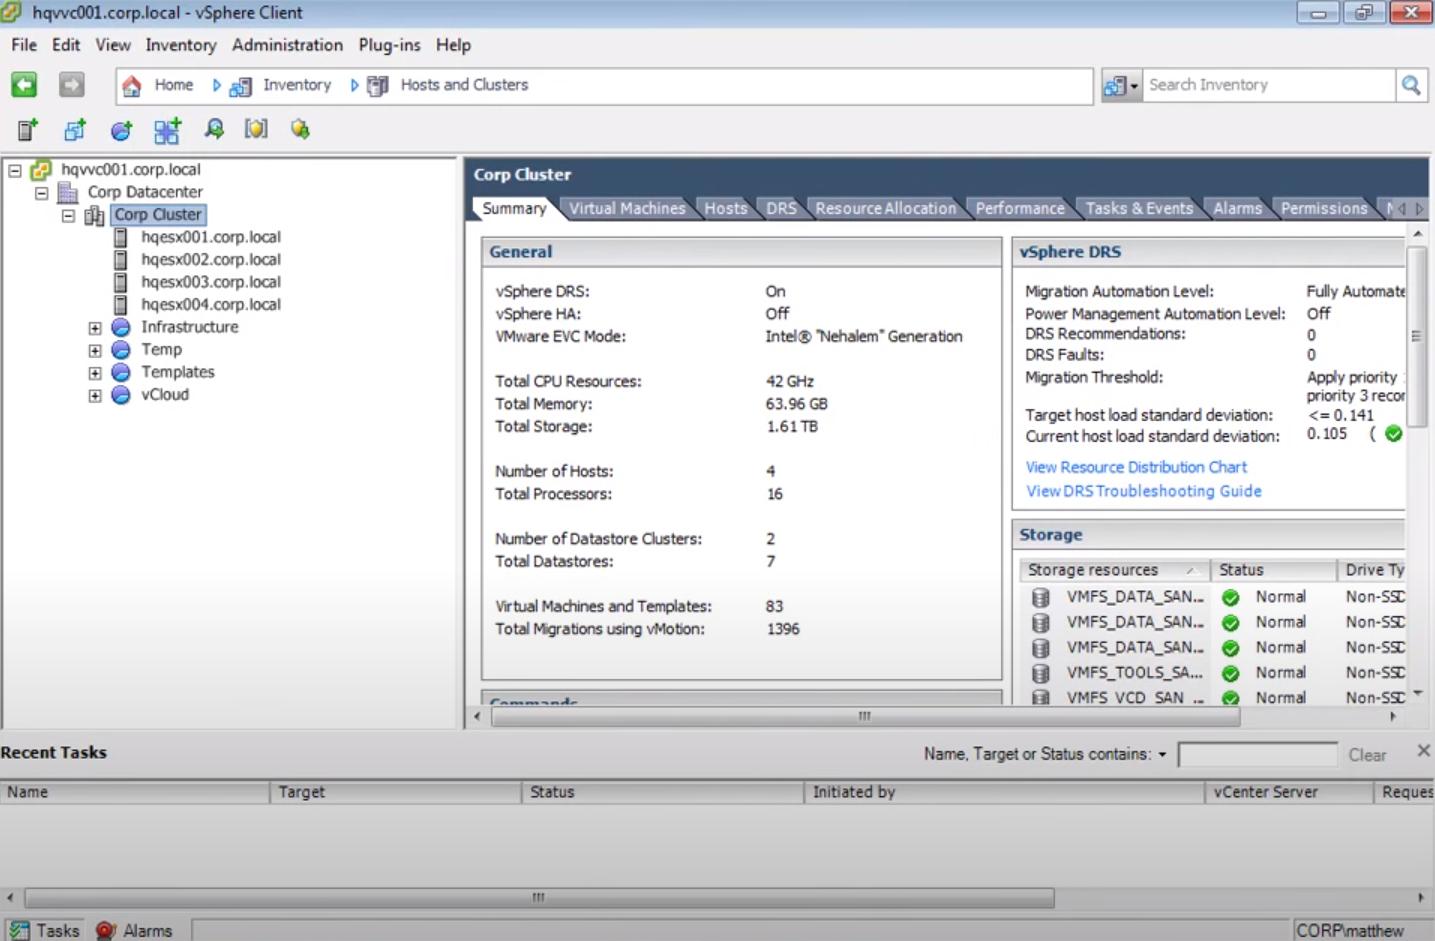 VMware corp cluster